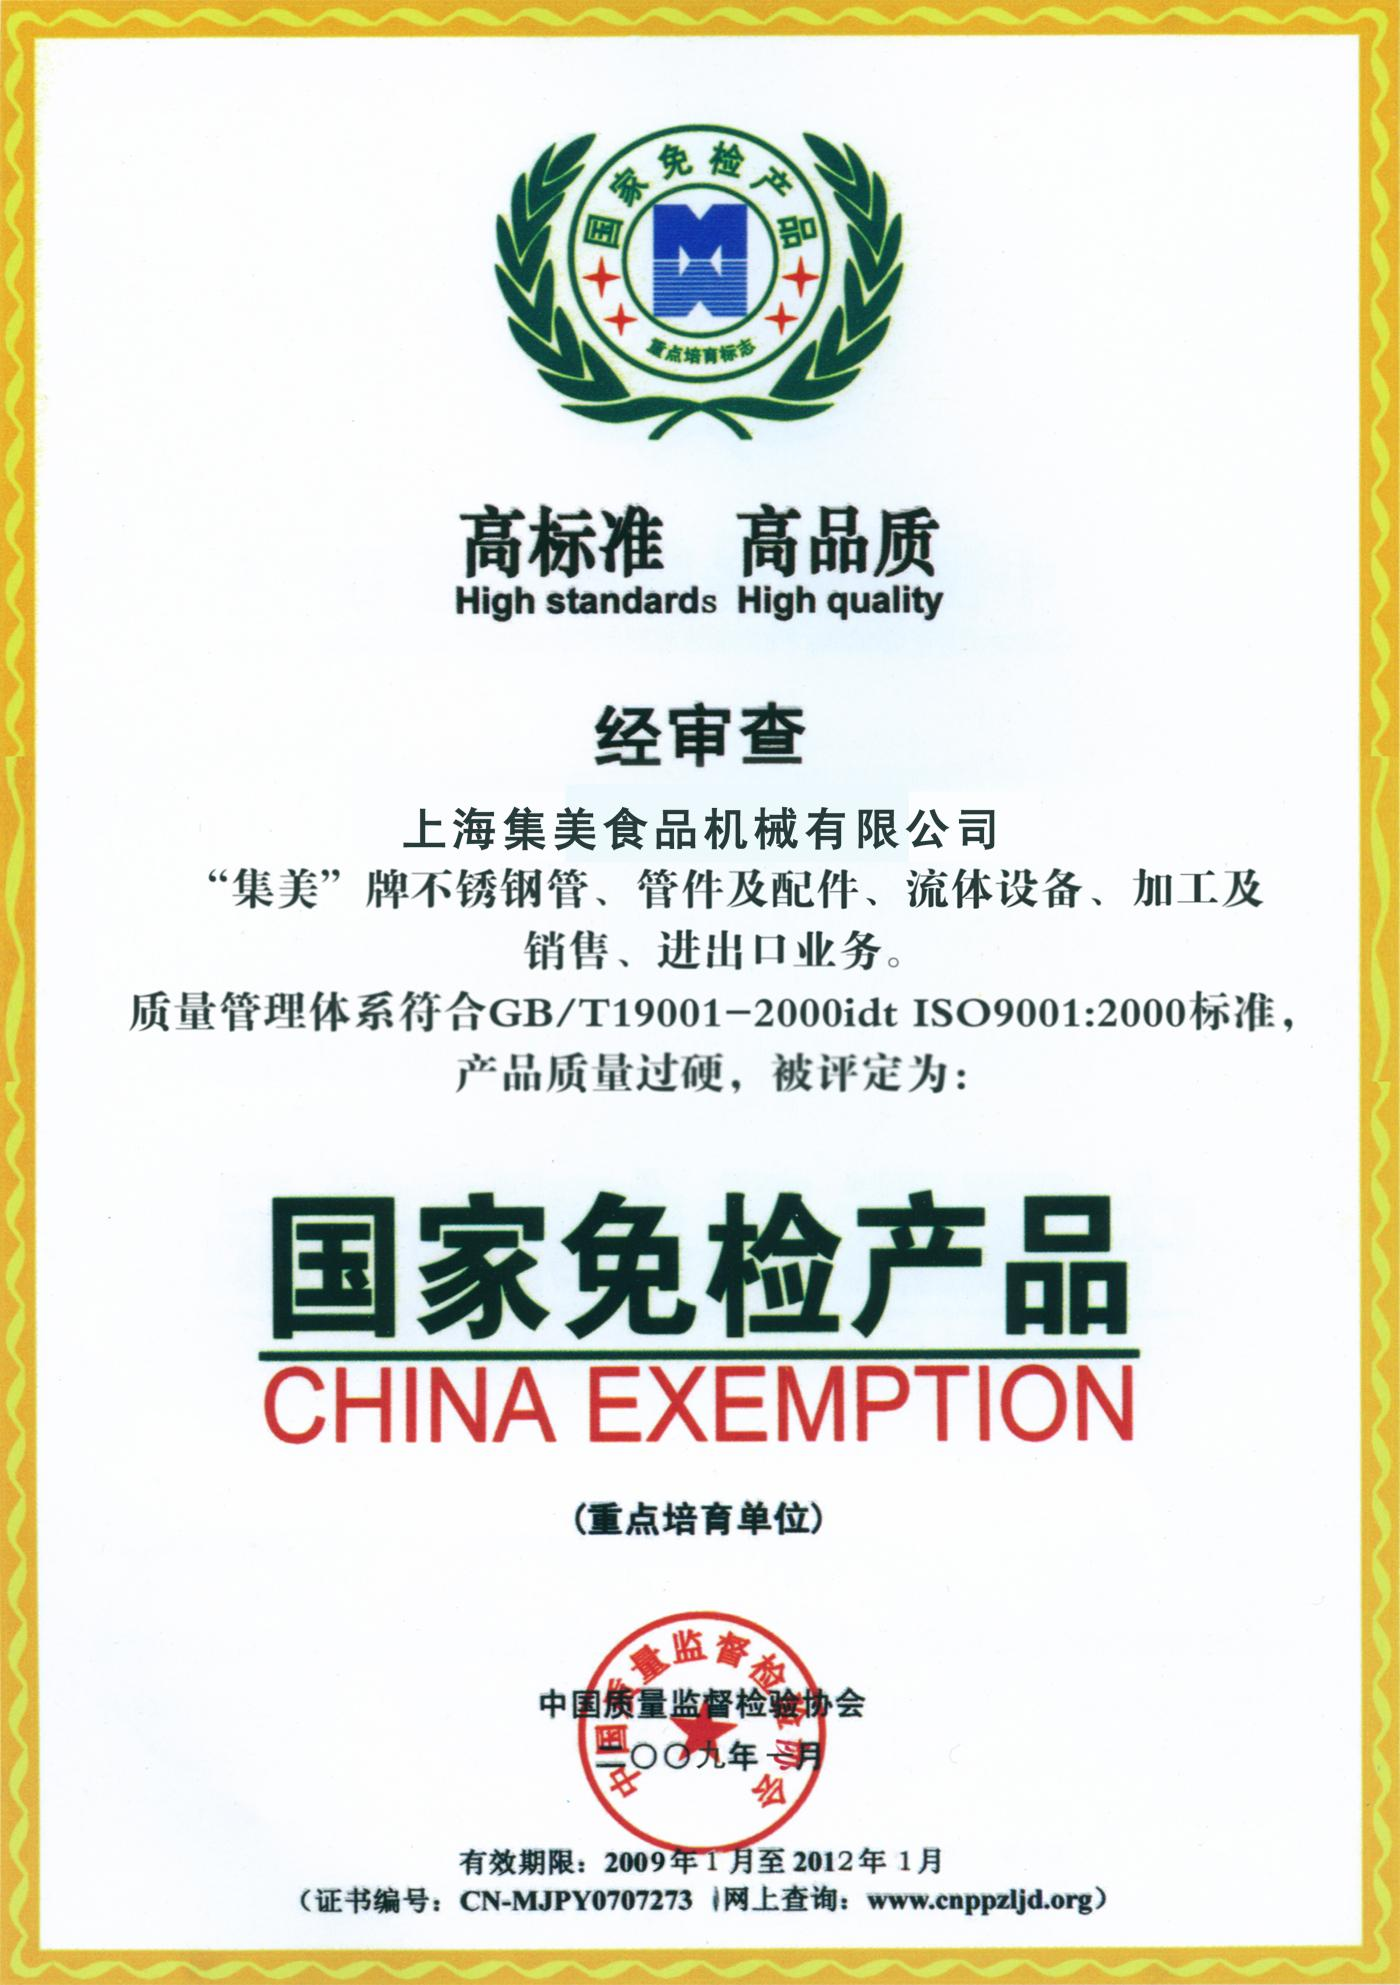 CHINA EXEMPTION